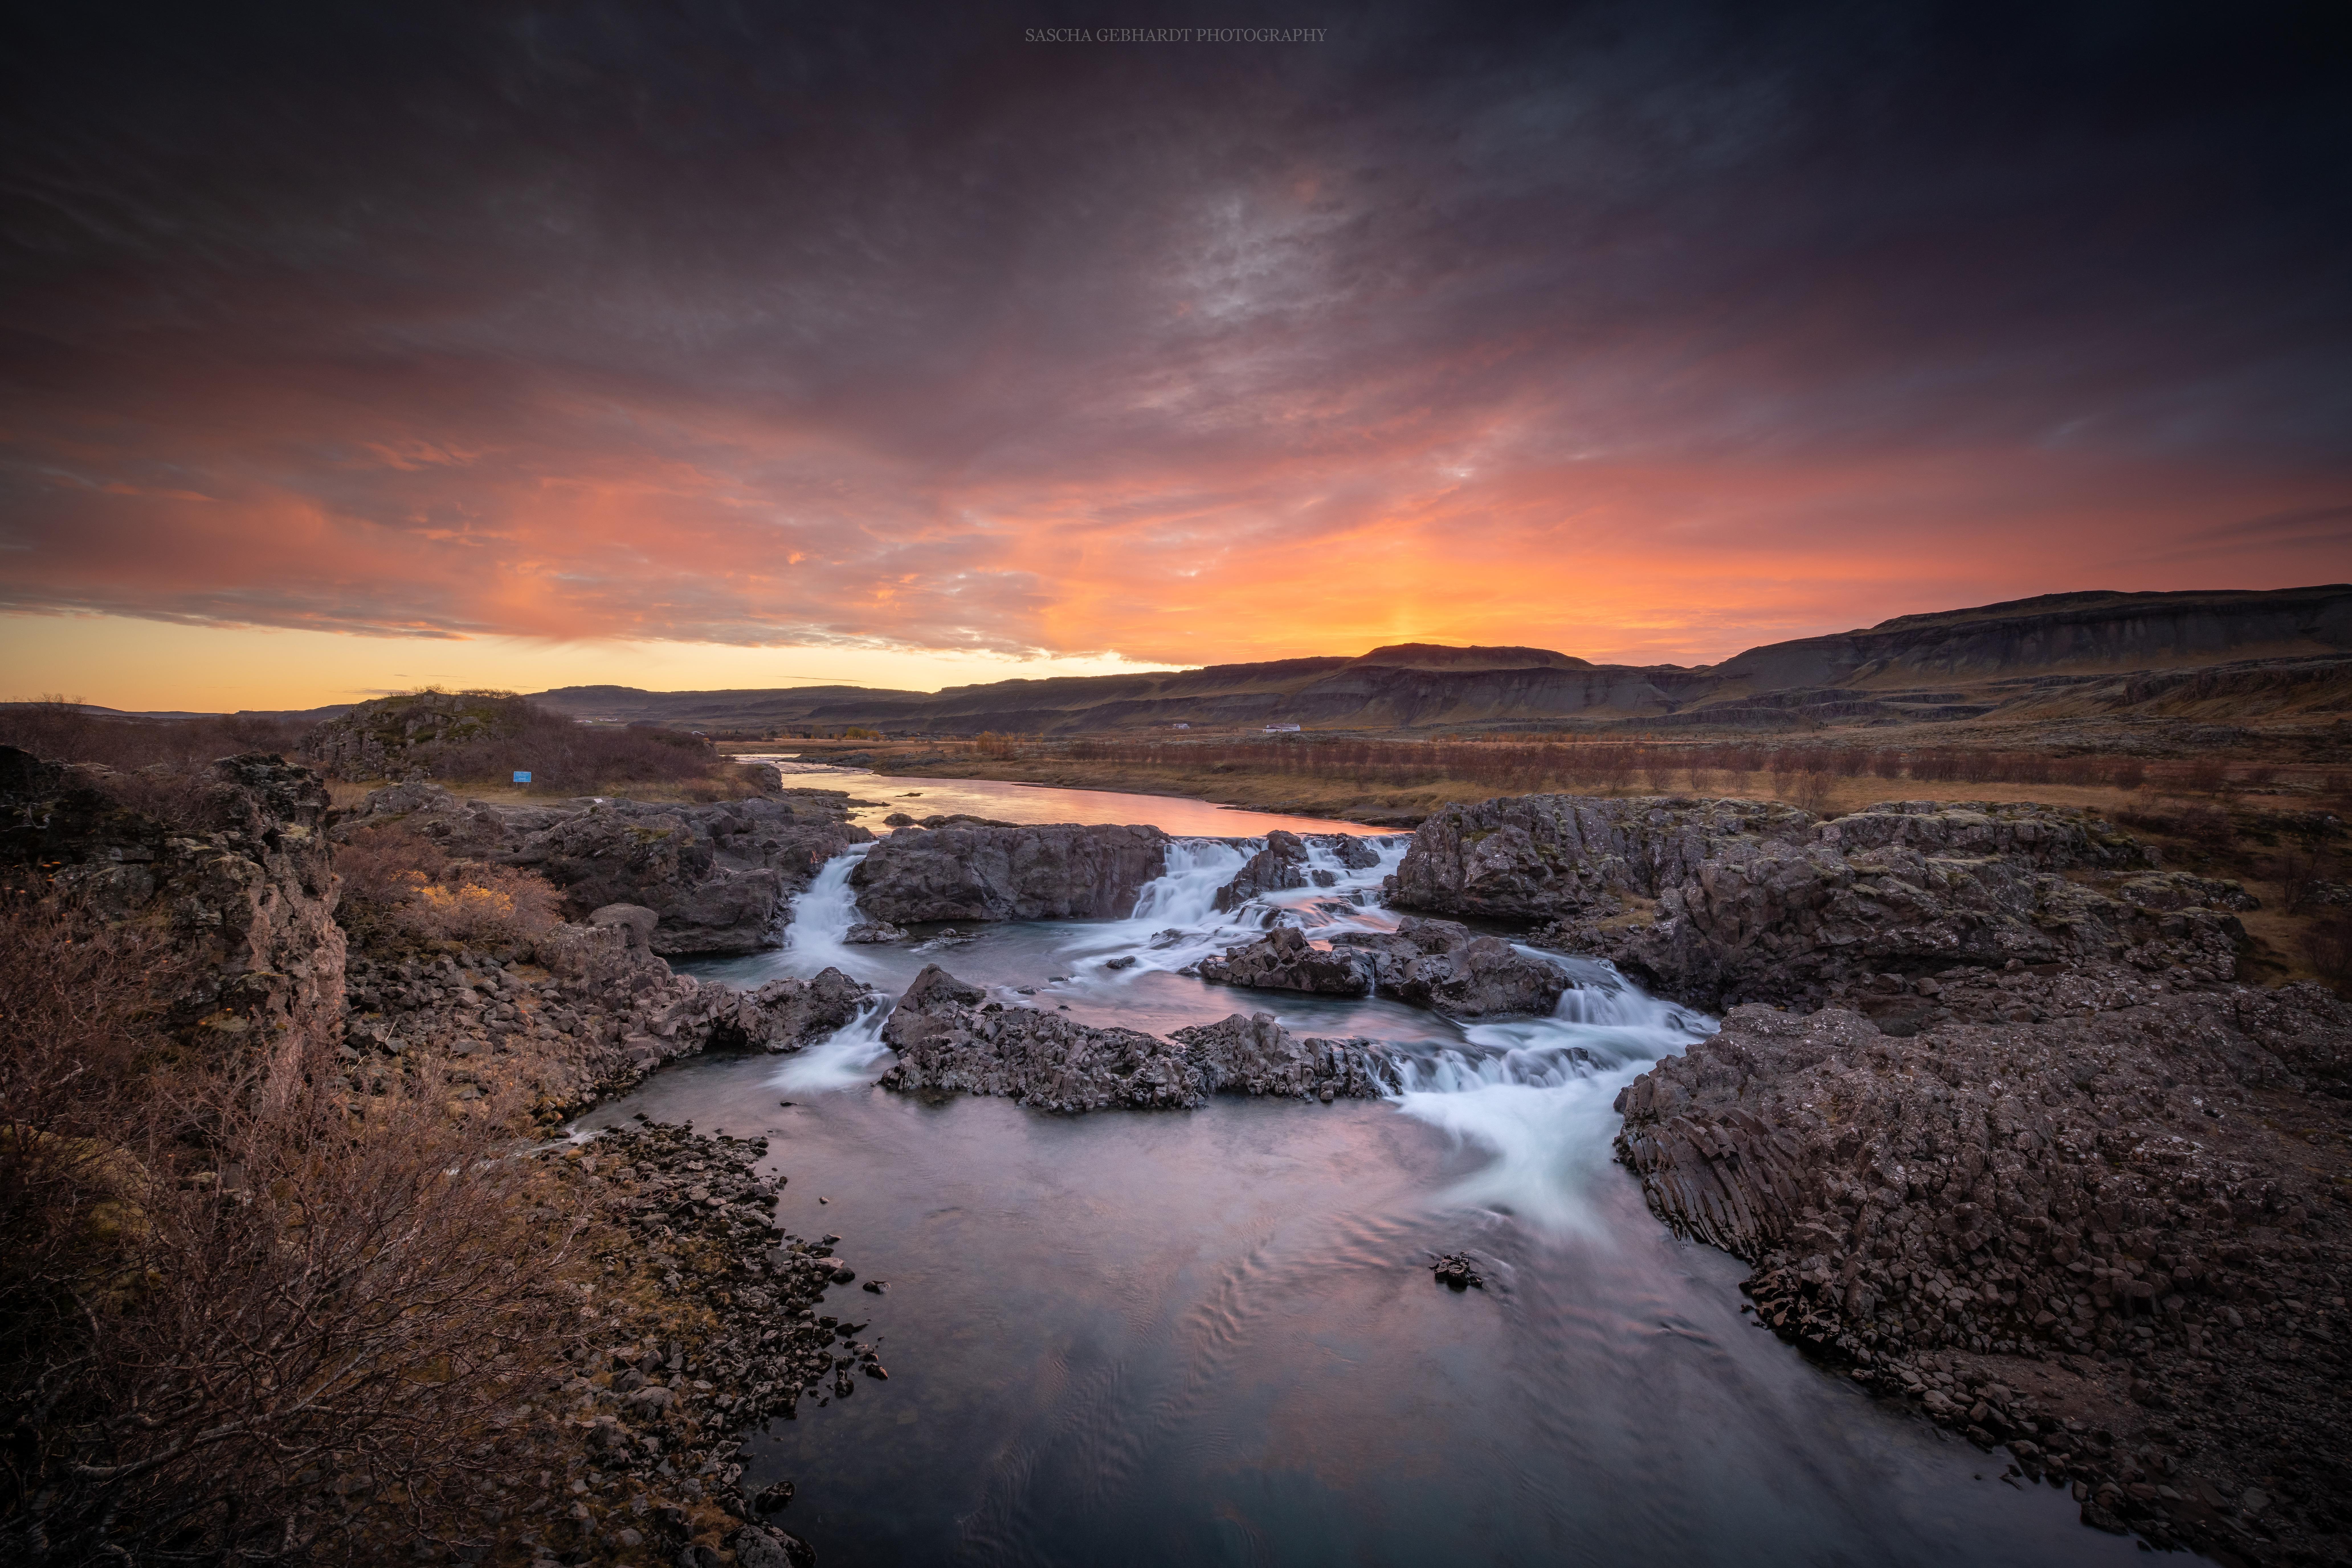 glanni iceland sunrise 1574937771 - Glanni Iceland Sunrise -